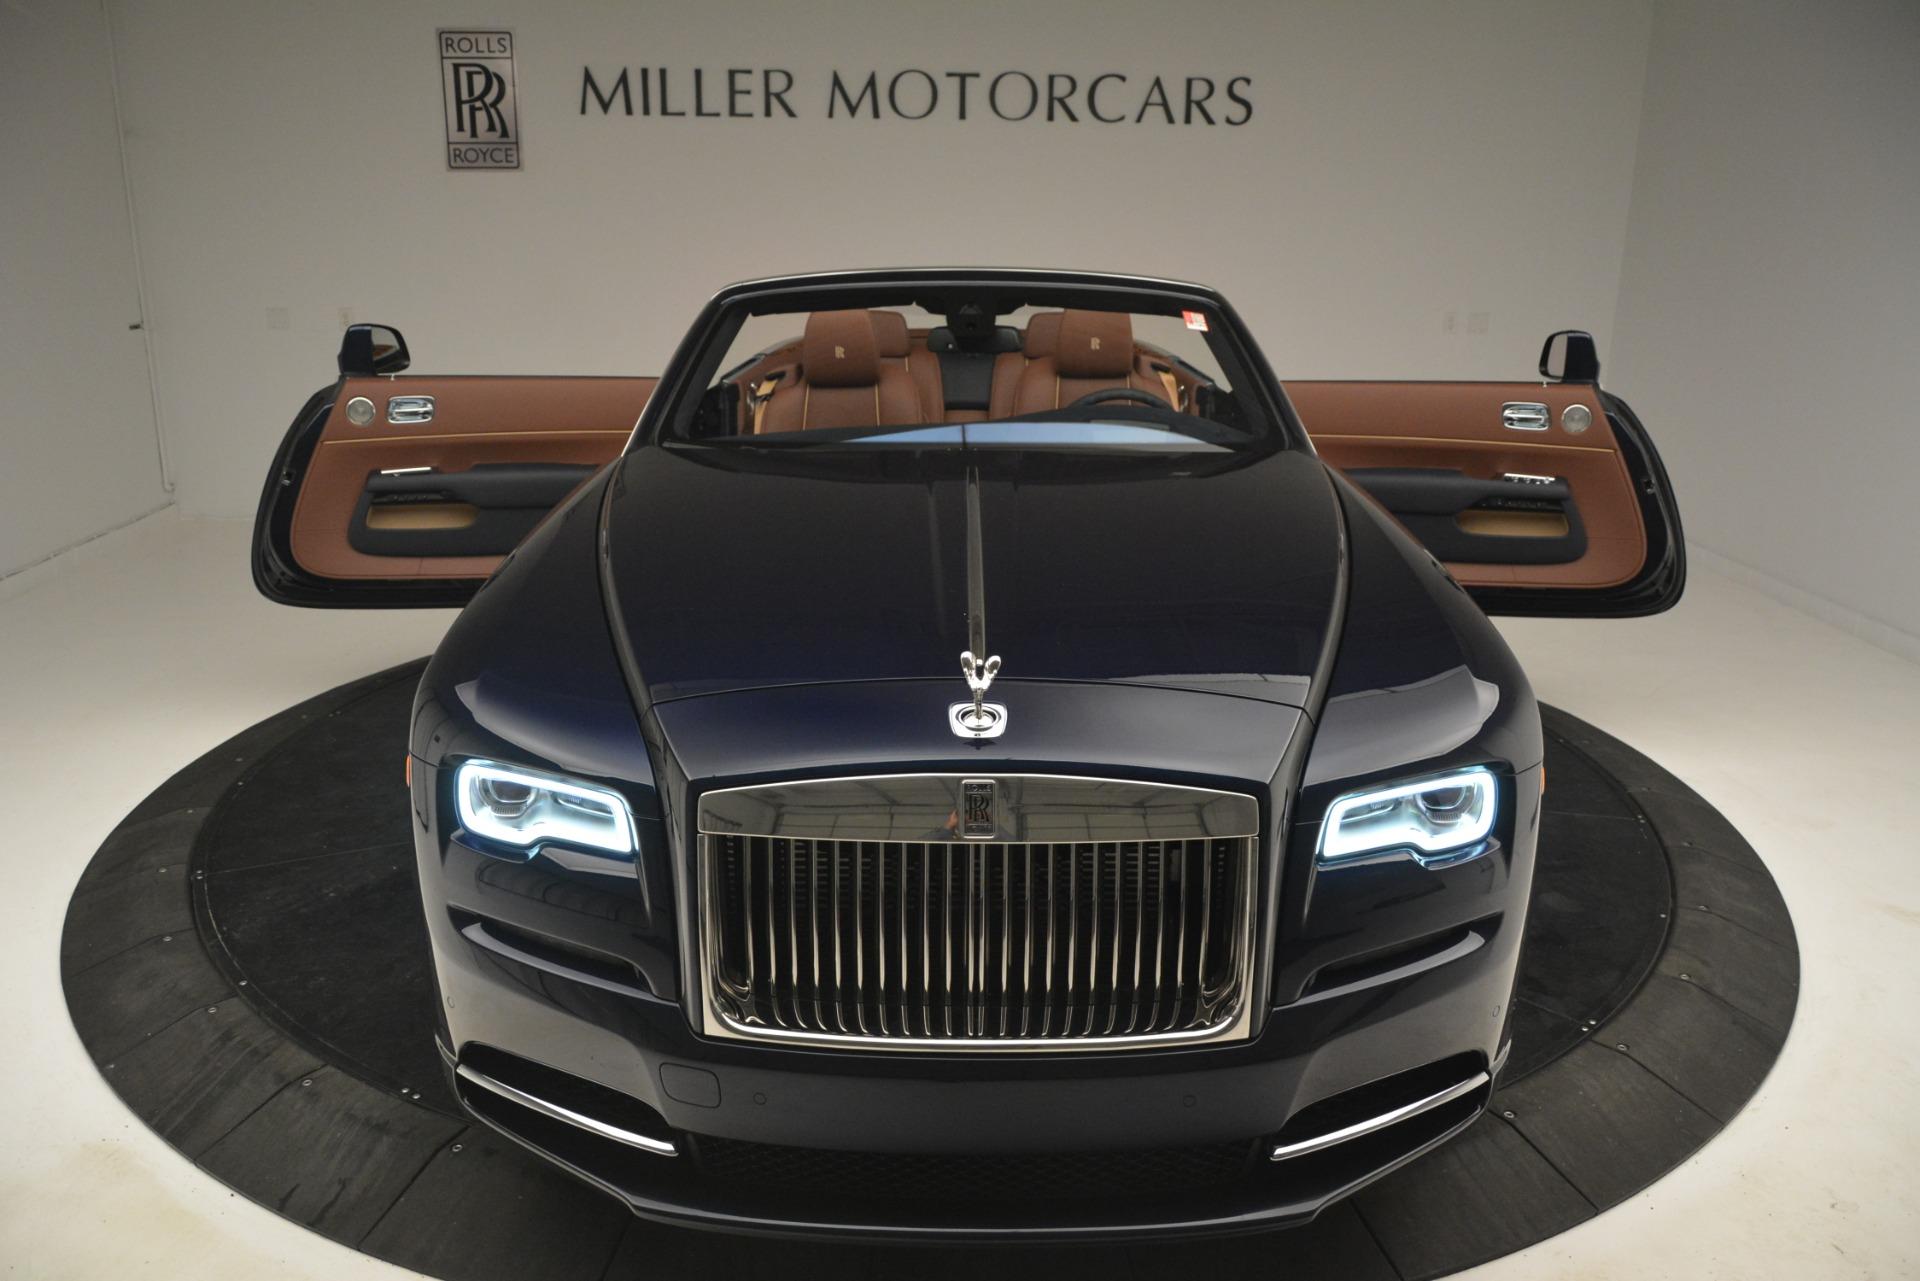 New 2019 Rolls-Royce Dawn  For Sale In Greenwich, CT 2723_p54